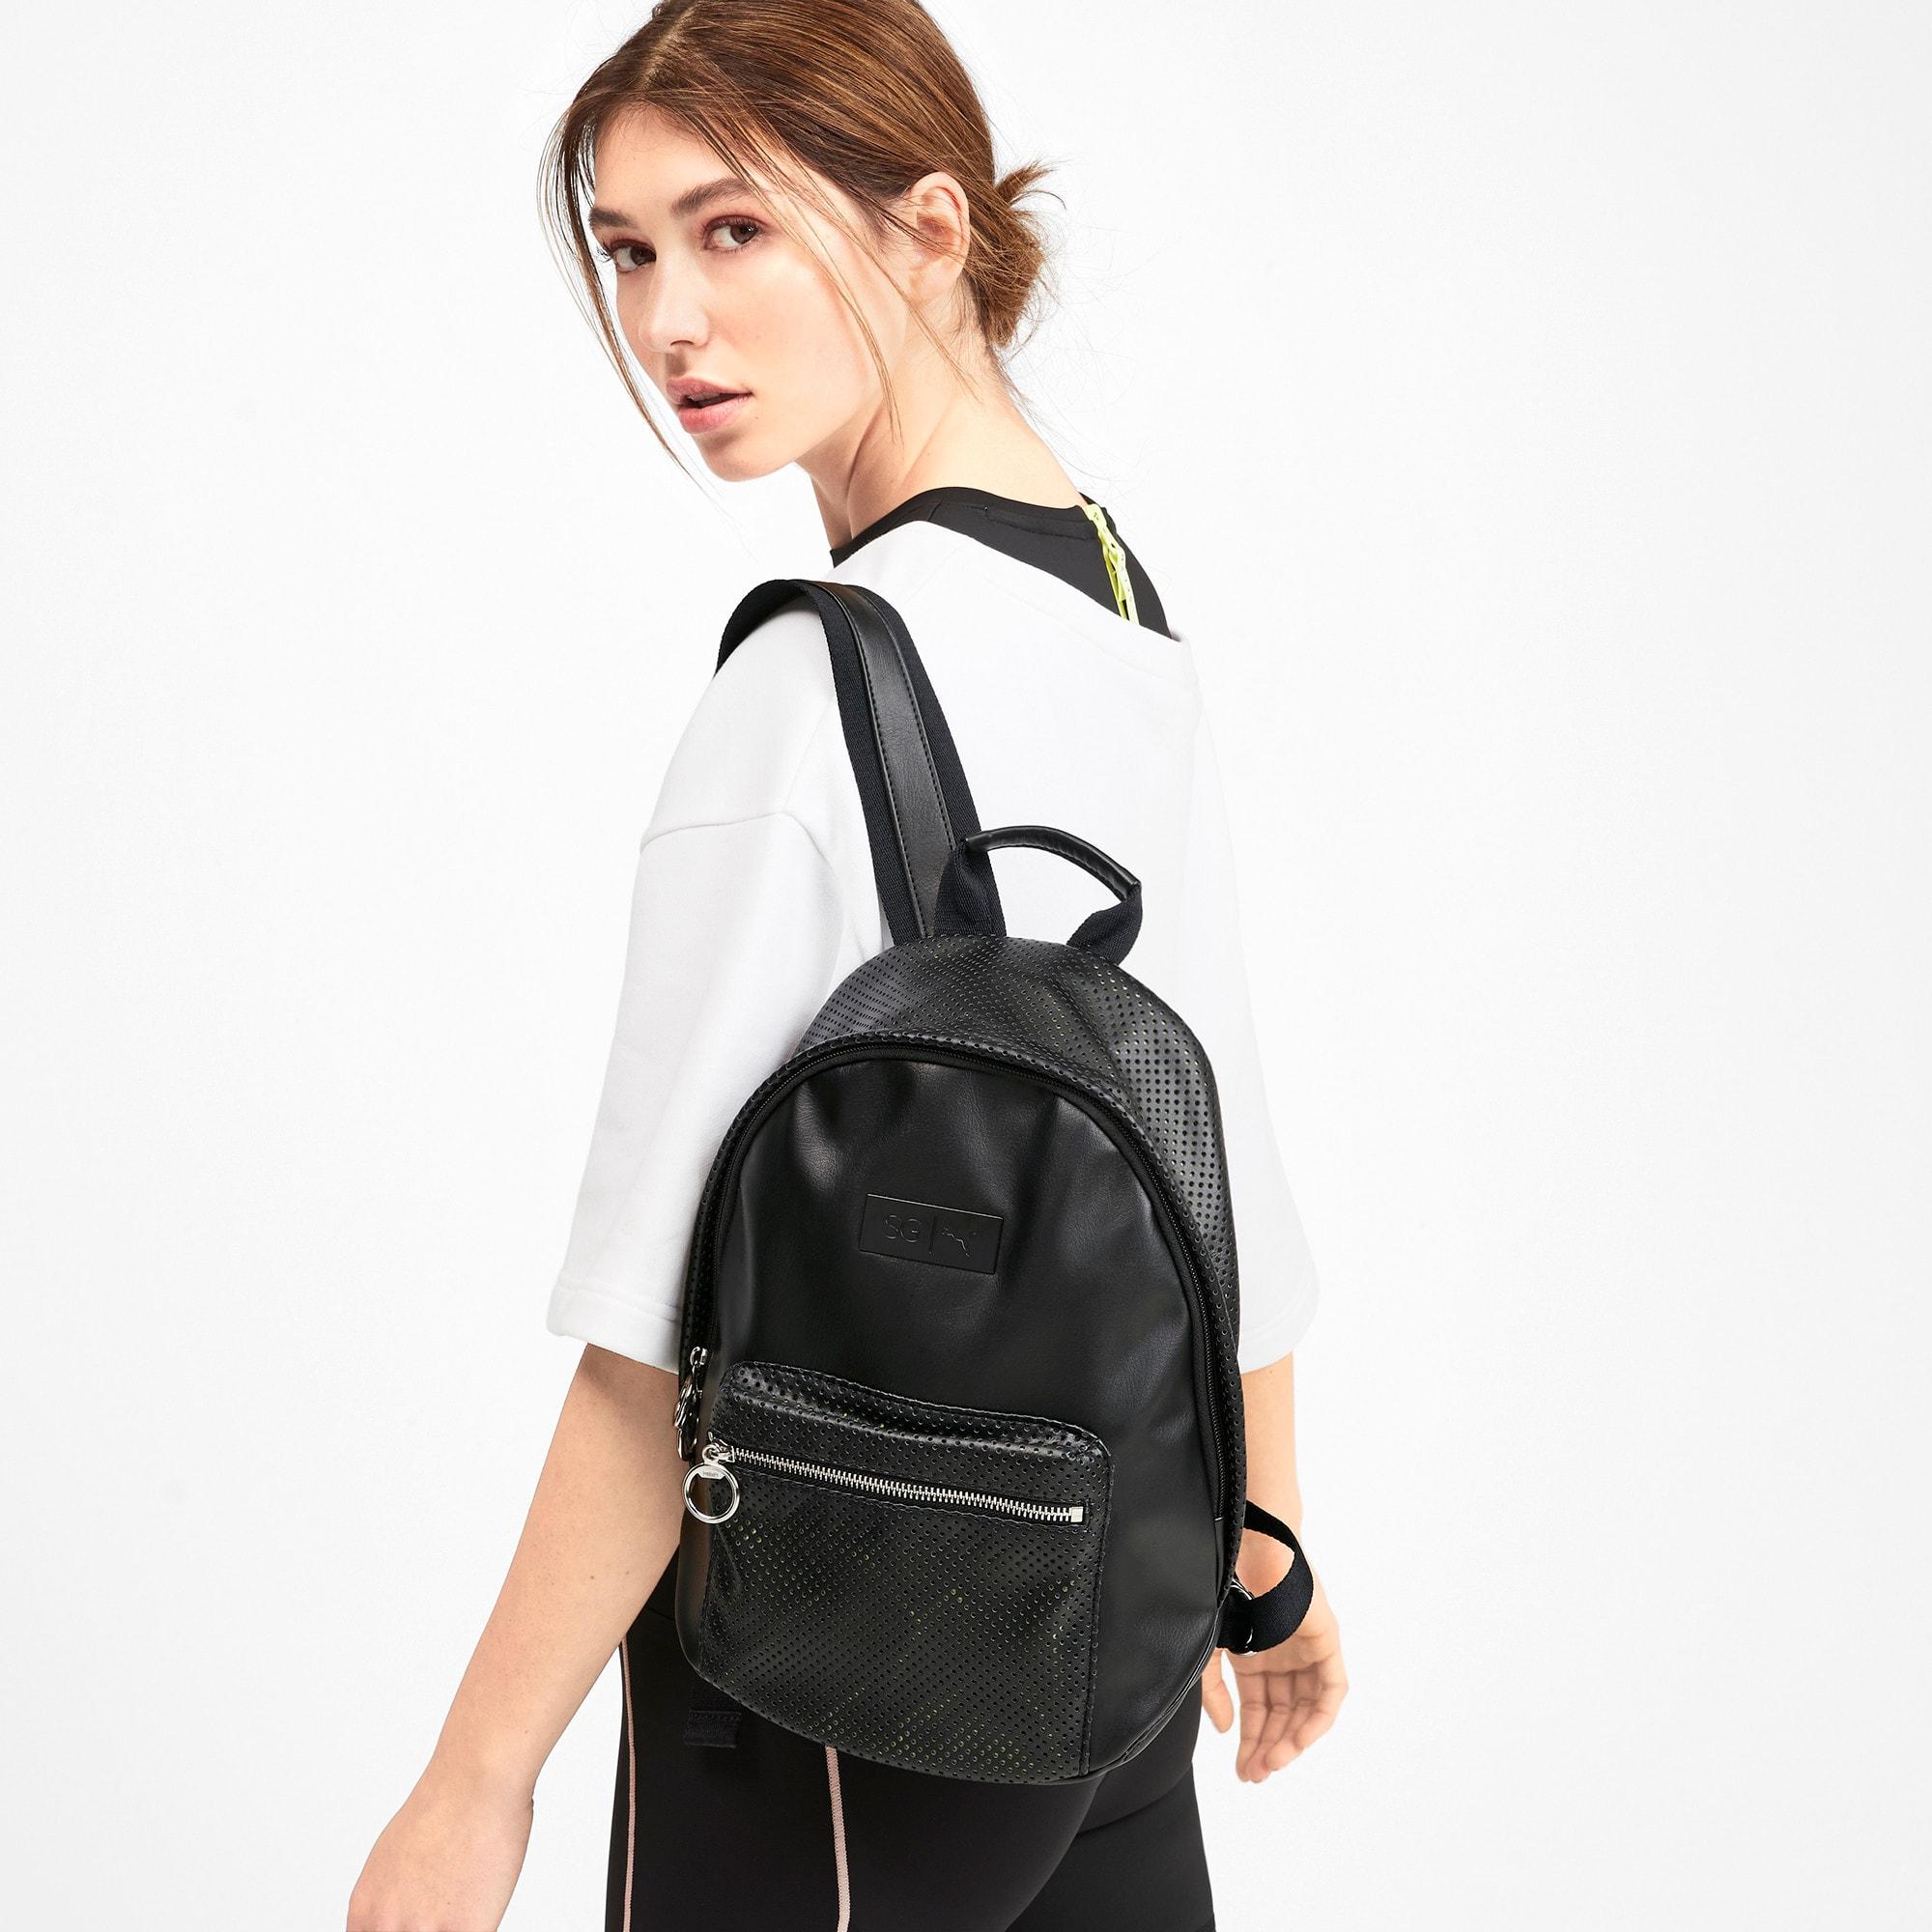 Thumbnail 2 of PUMA x SELENA GOMEZ Style Women's Backpack, Puma Black, medium